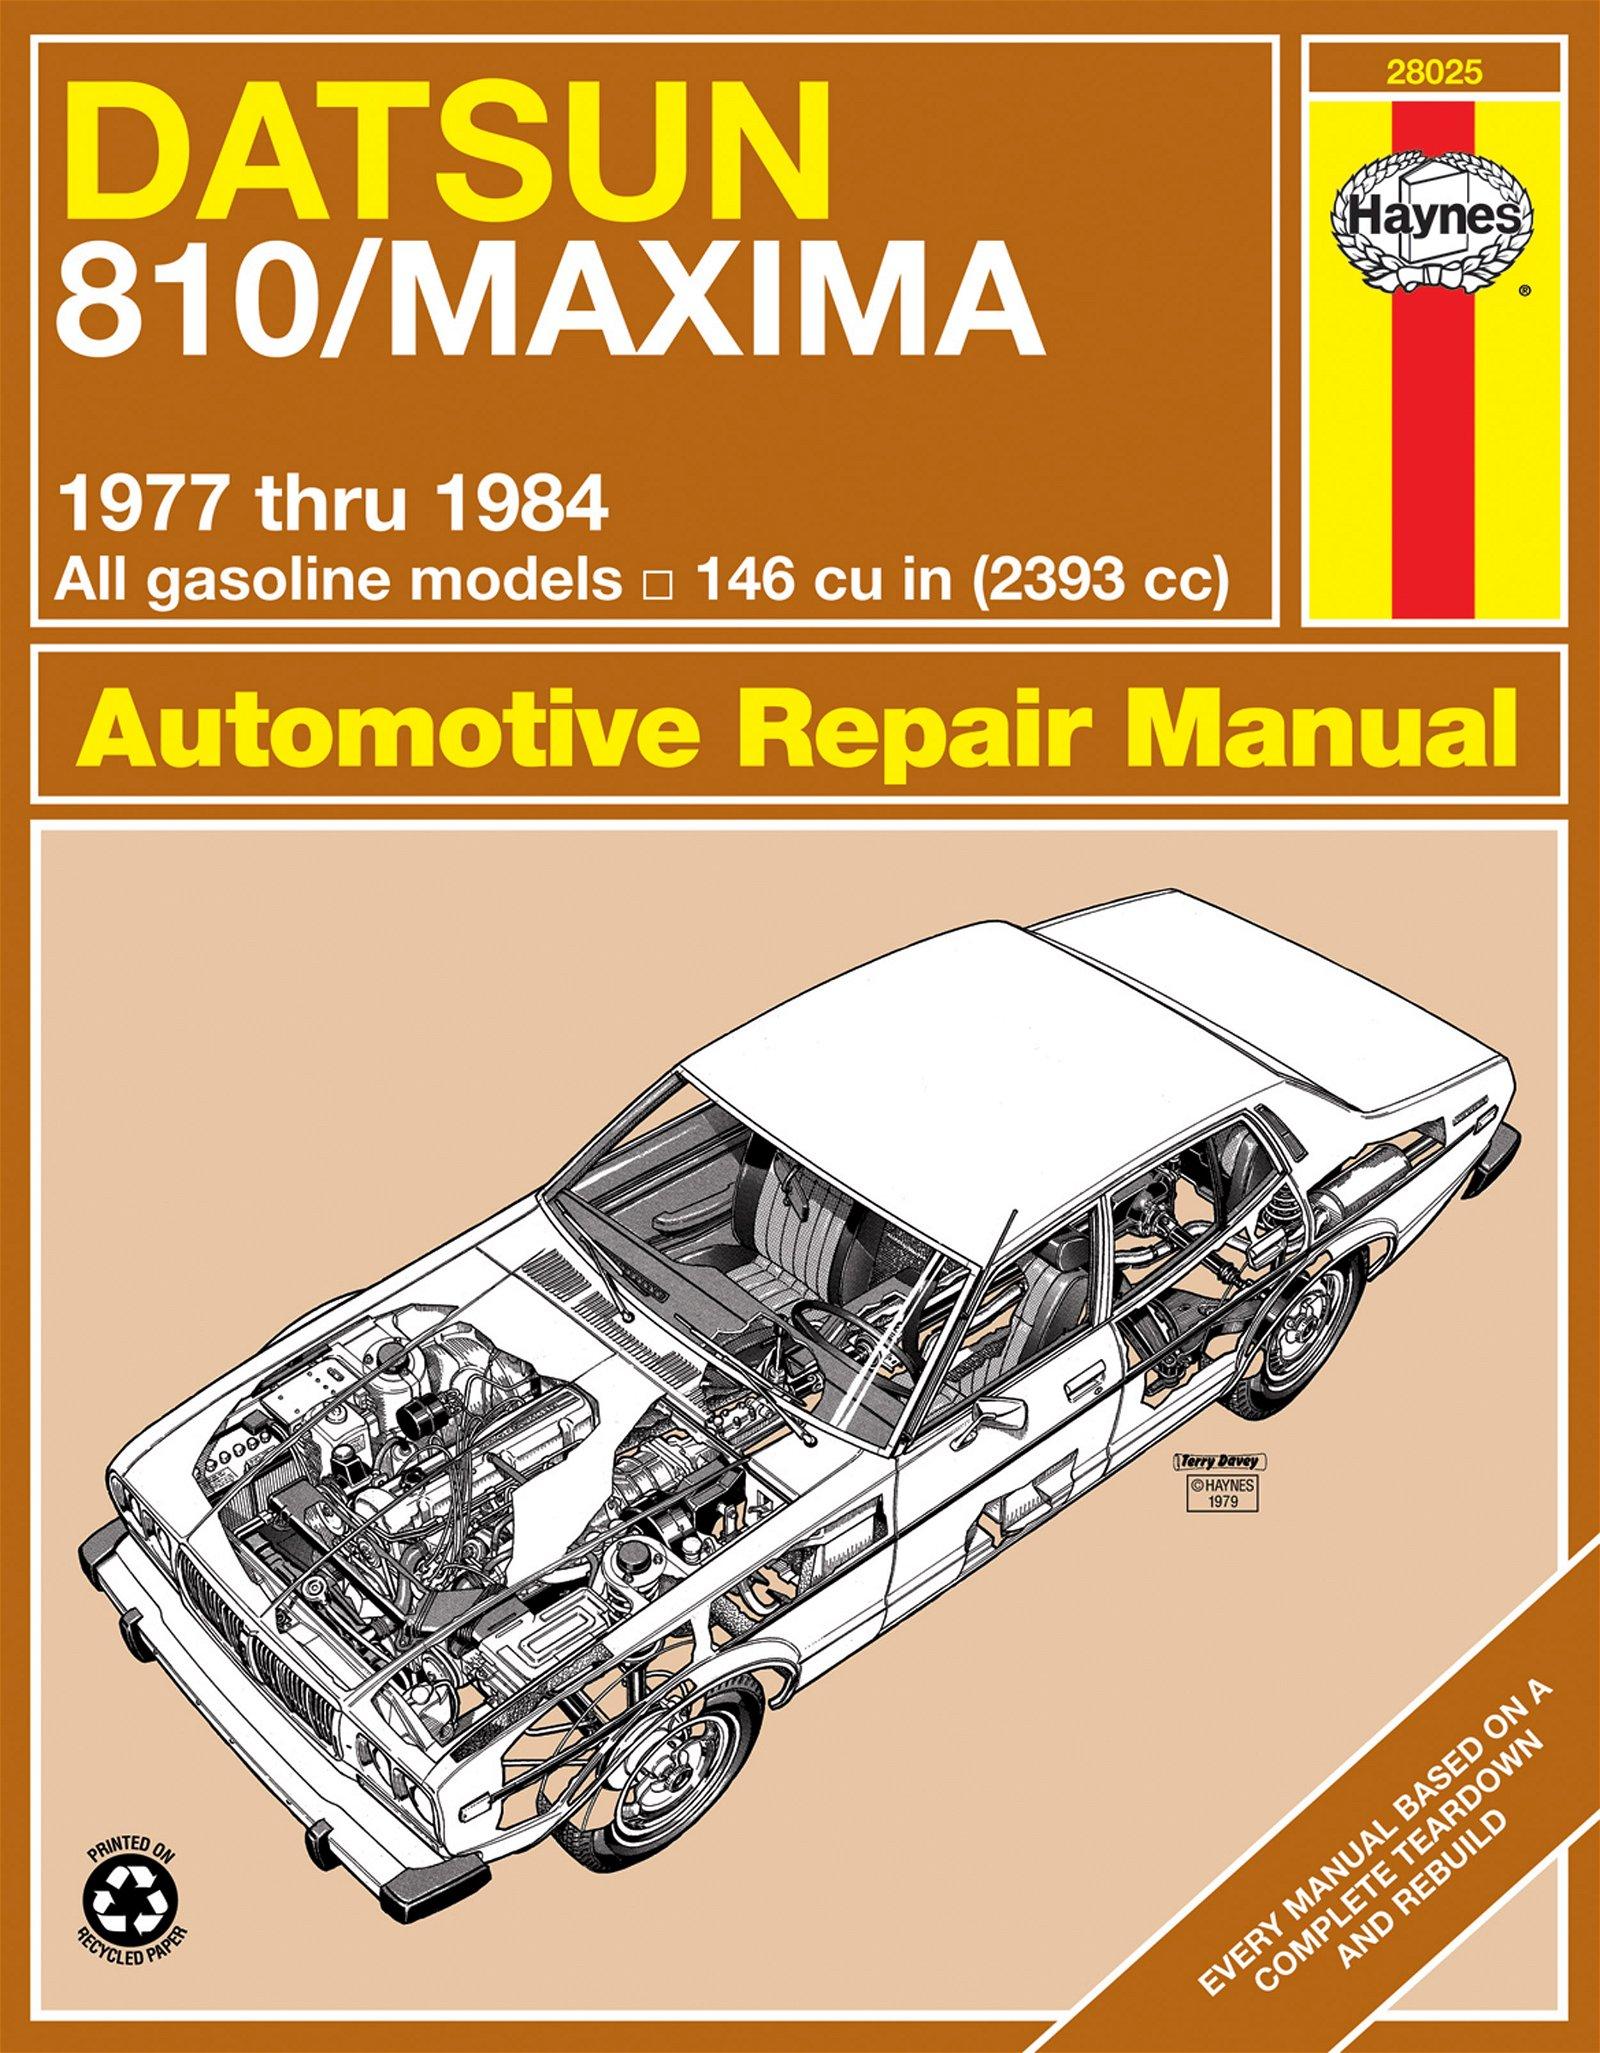 [Manuel US en Anglais] Datsun 810/Maxima  '77 -  '84